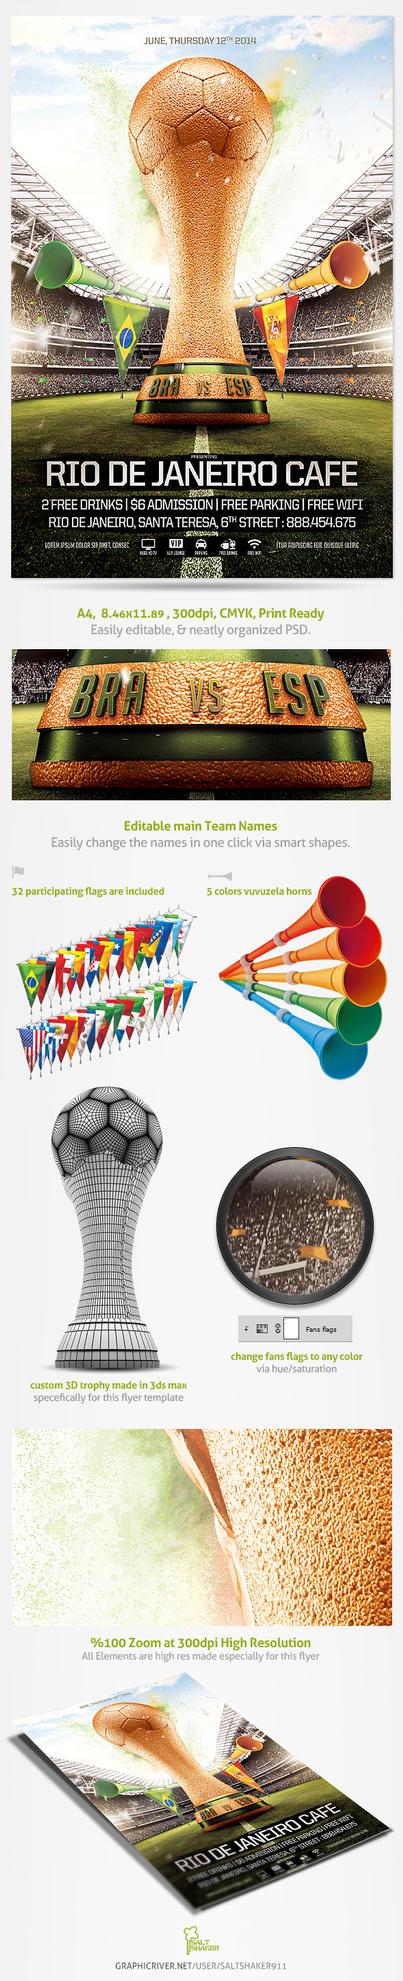 Brazil world Cup Flyer 2014 Template by saltshaker911